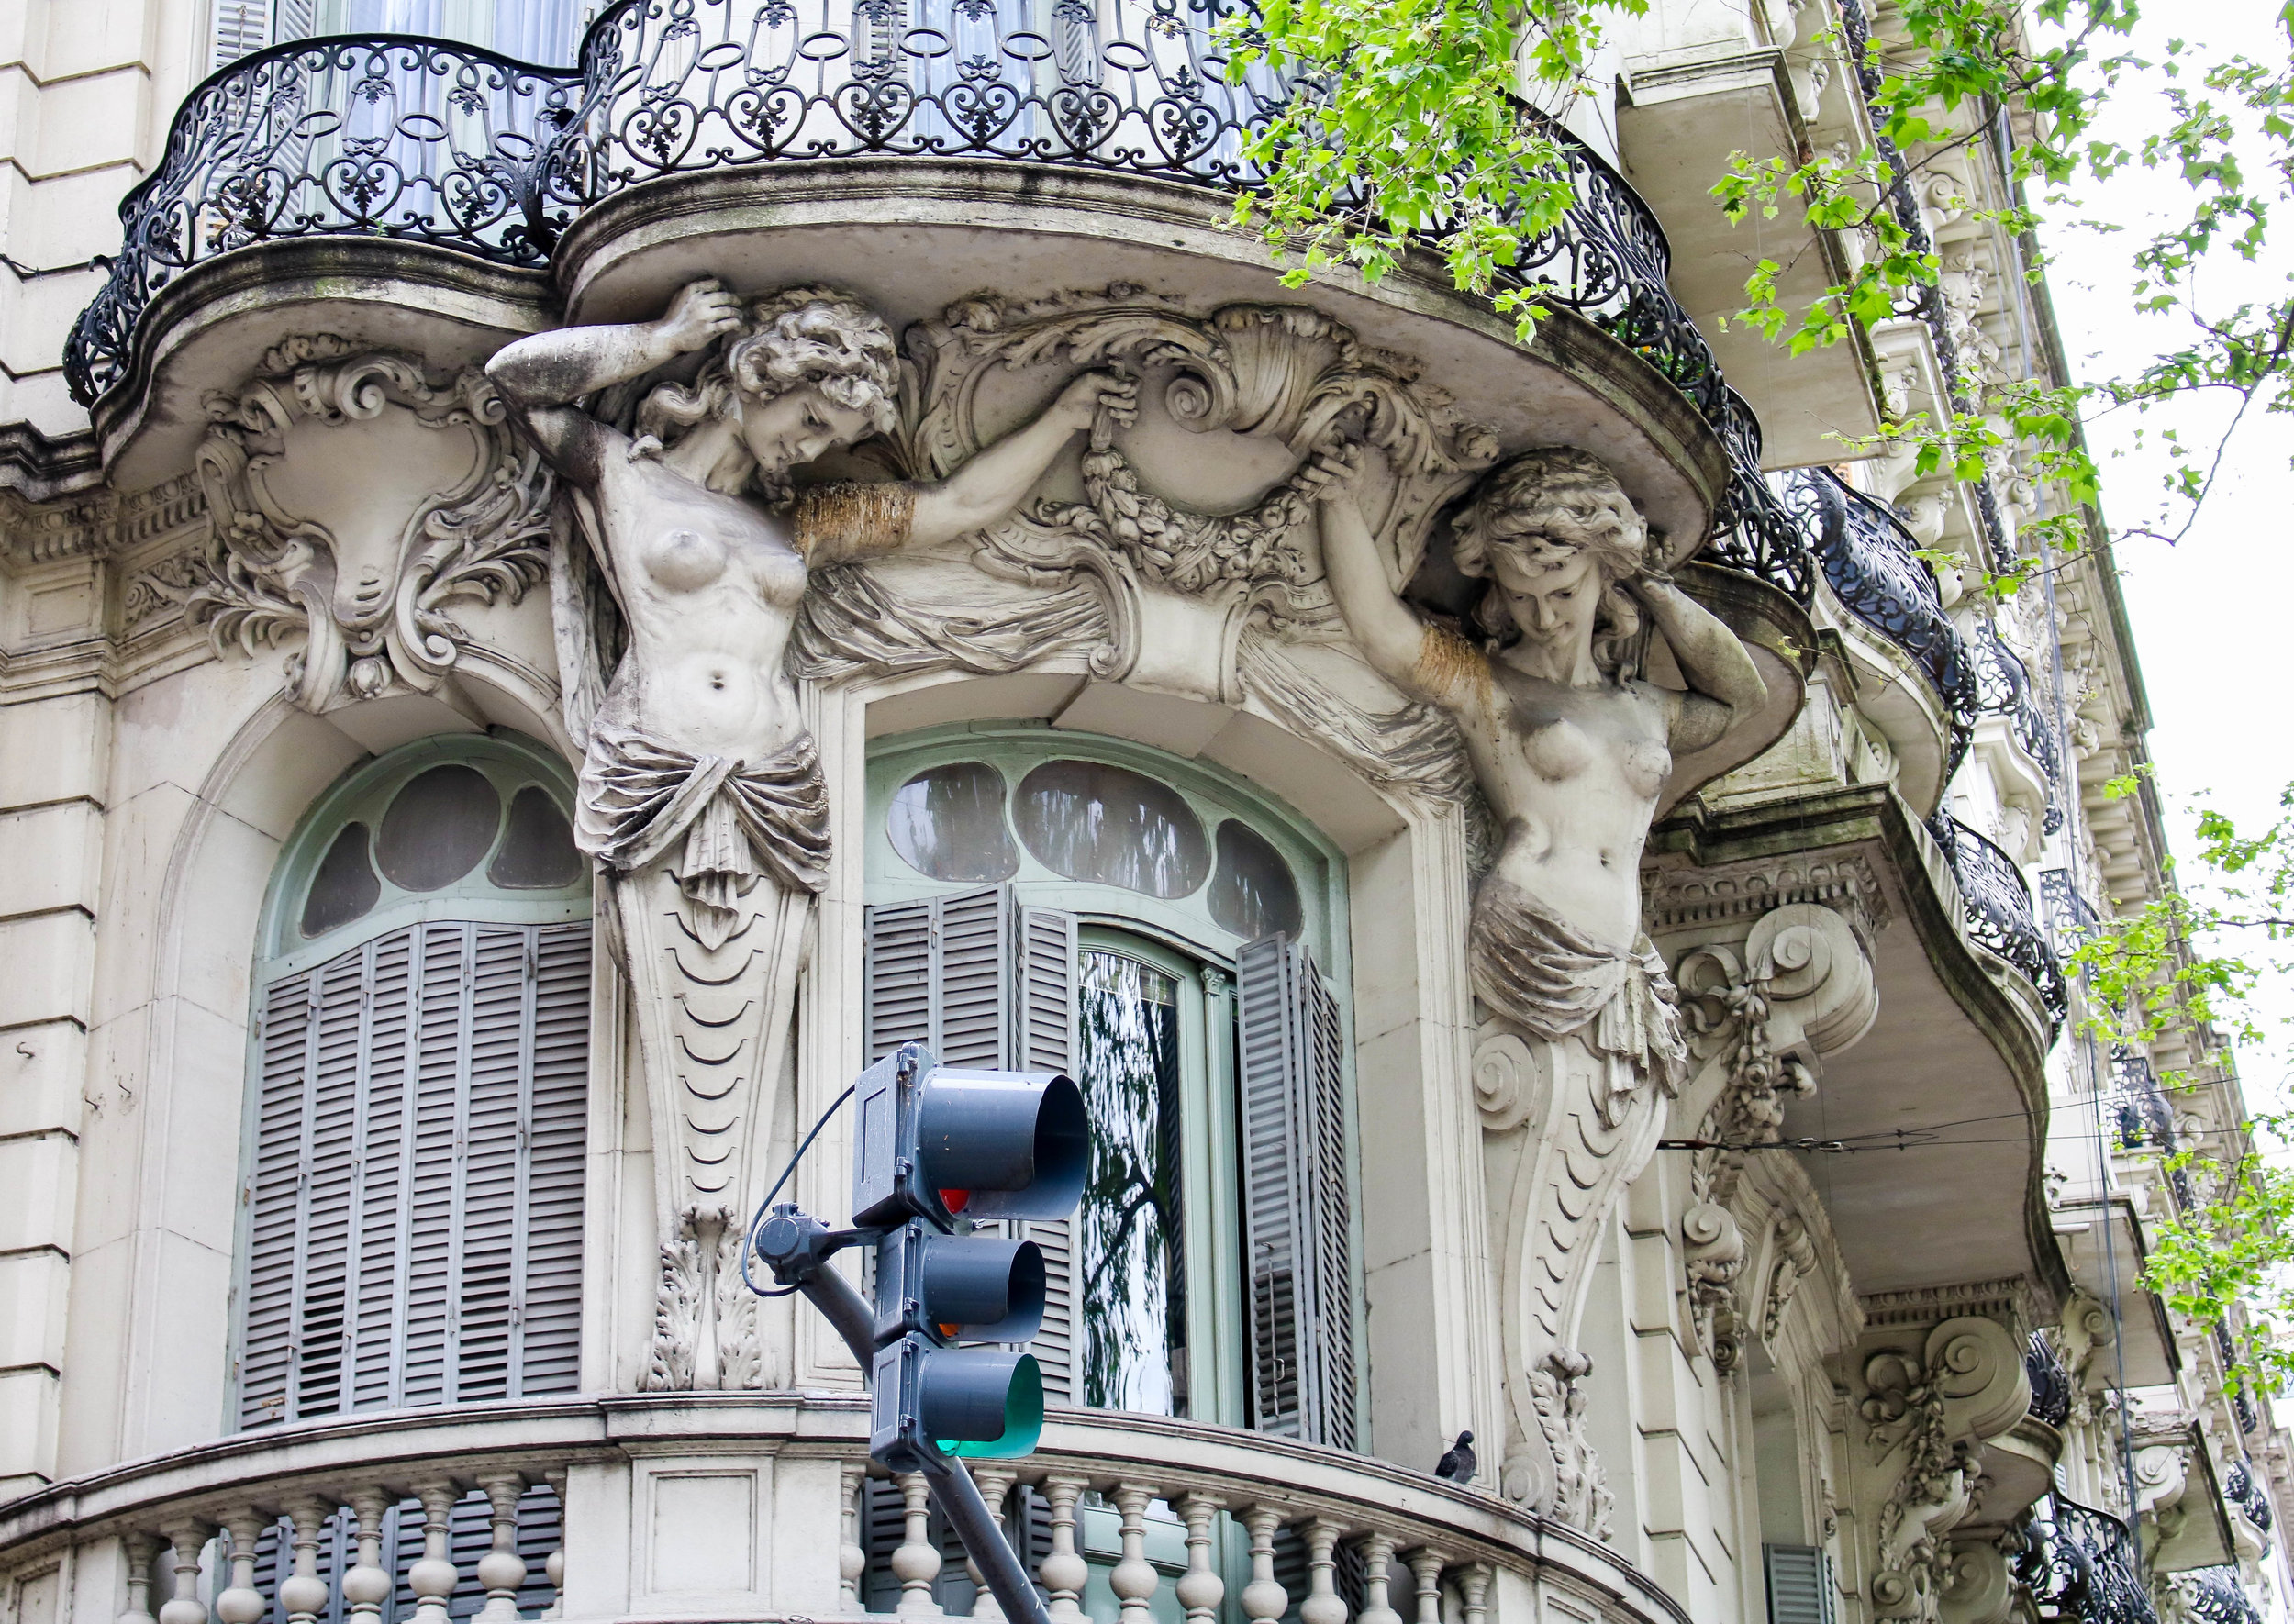 European Inspired Architecture